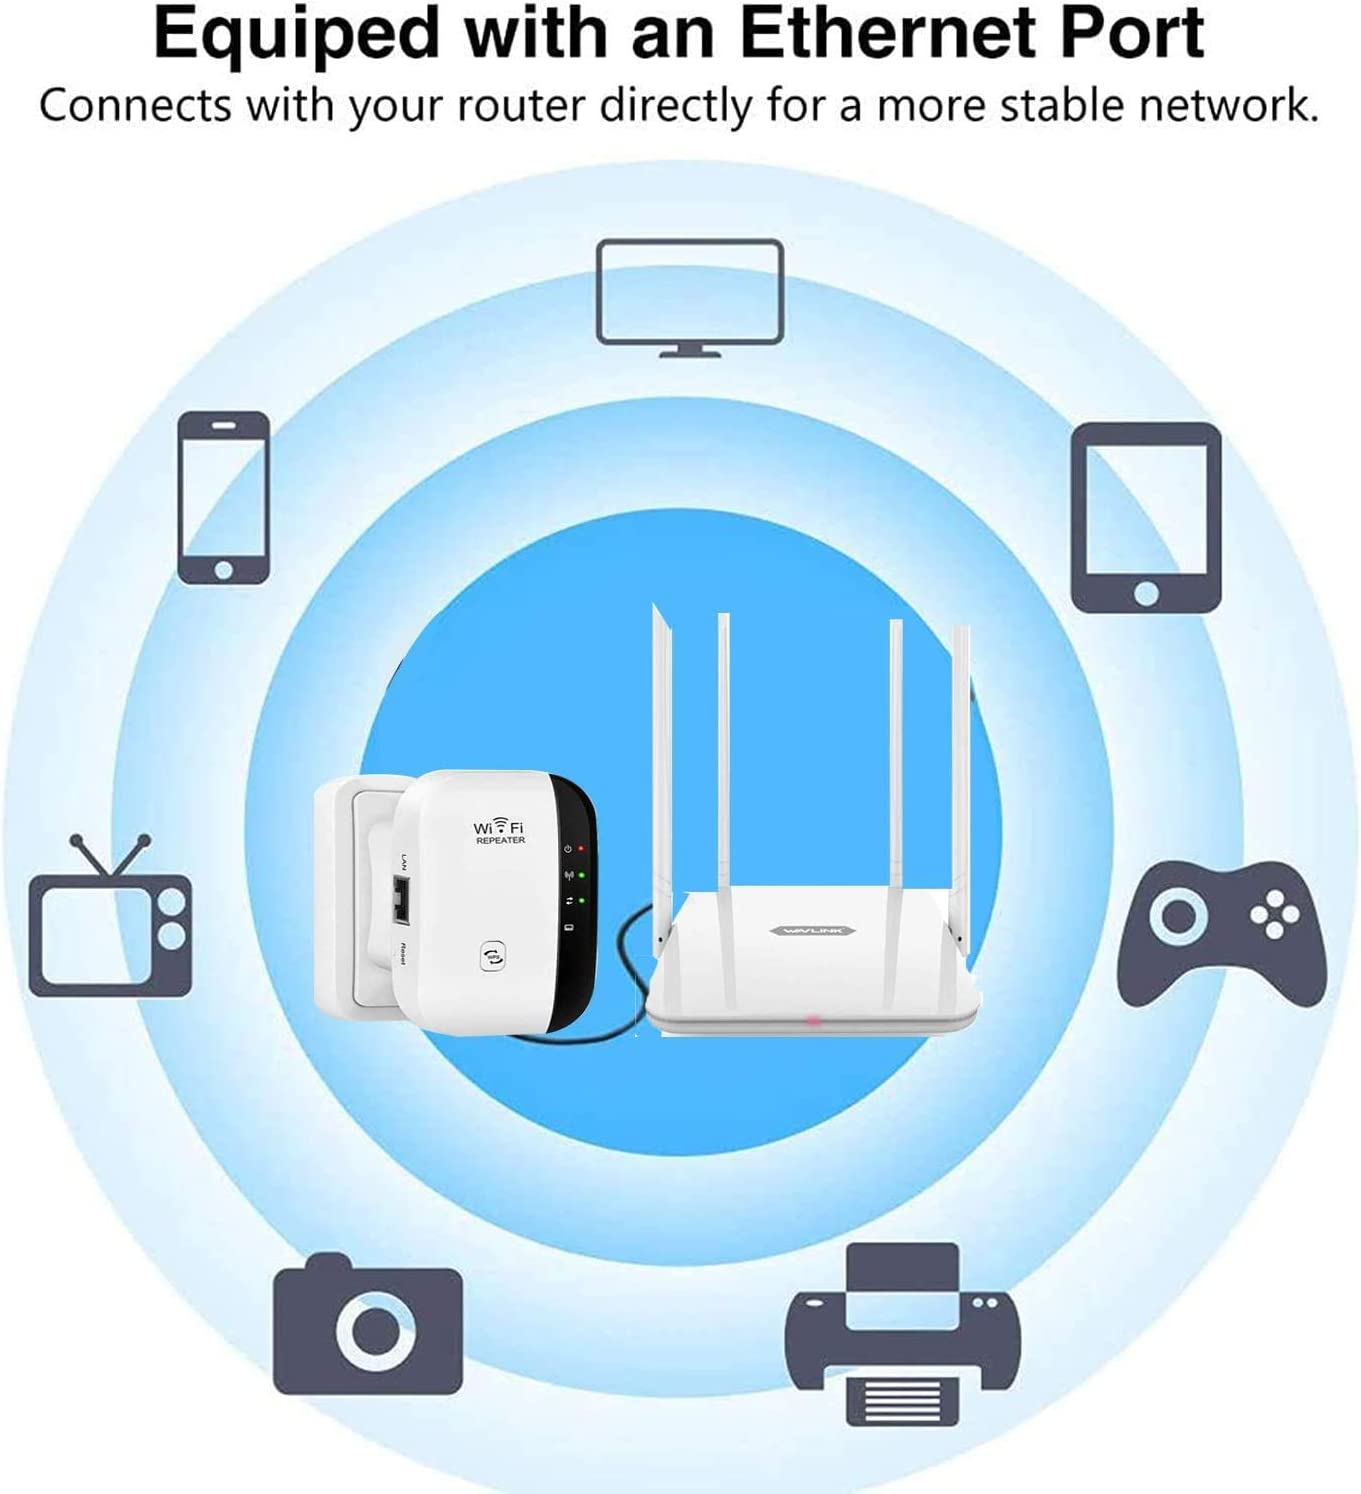 300Mbps,WPS,con Porto Ethernet,Interfaccia di Alimentazione,Porta LAN,ADSL. MISSJJ Ripetitore WiFi WiFi Extender 2,4GHz